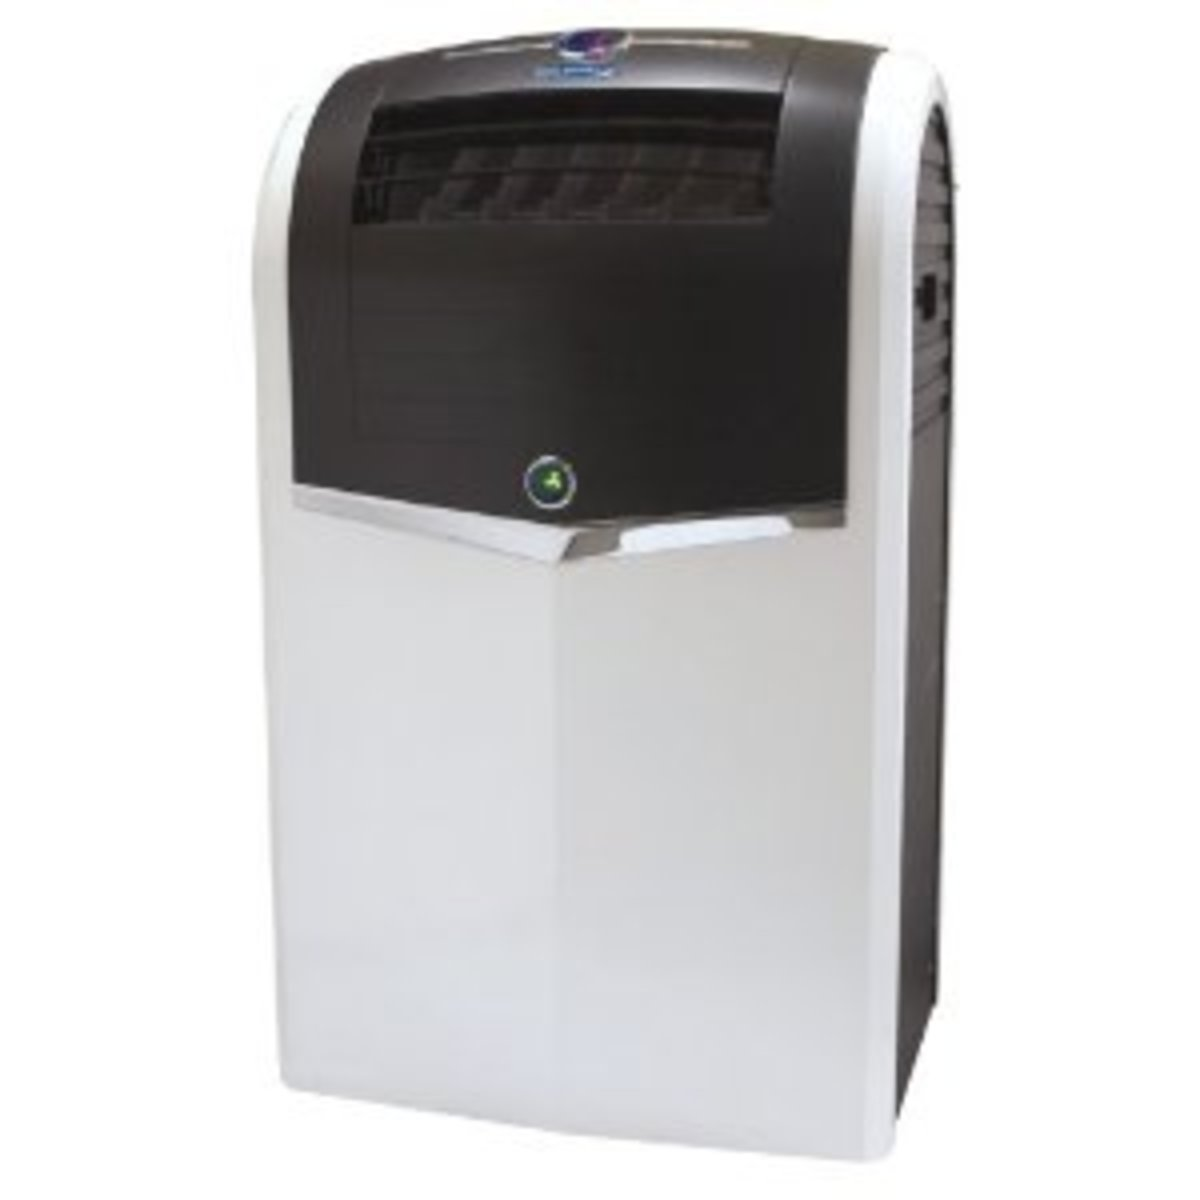 Soleus Air PH4-13R-01 13,000 BTU Evaporative Portable Air Conditioner, 13,000 BTU Heater, Dehumidifier and Fan, White with Black